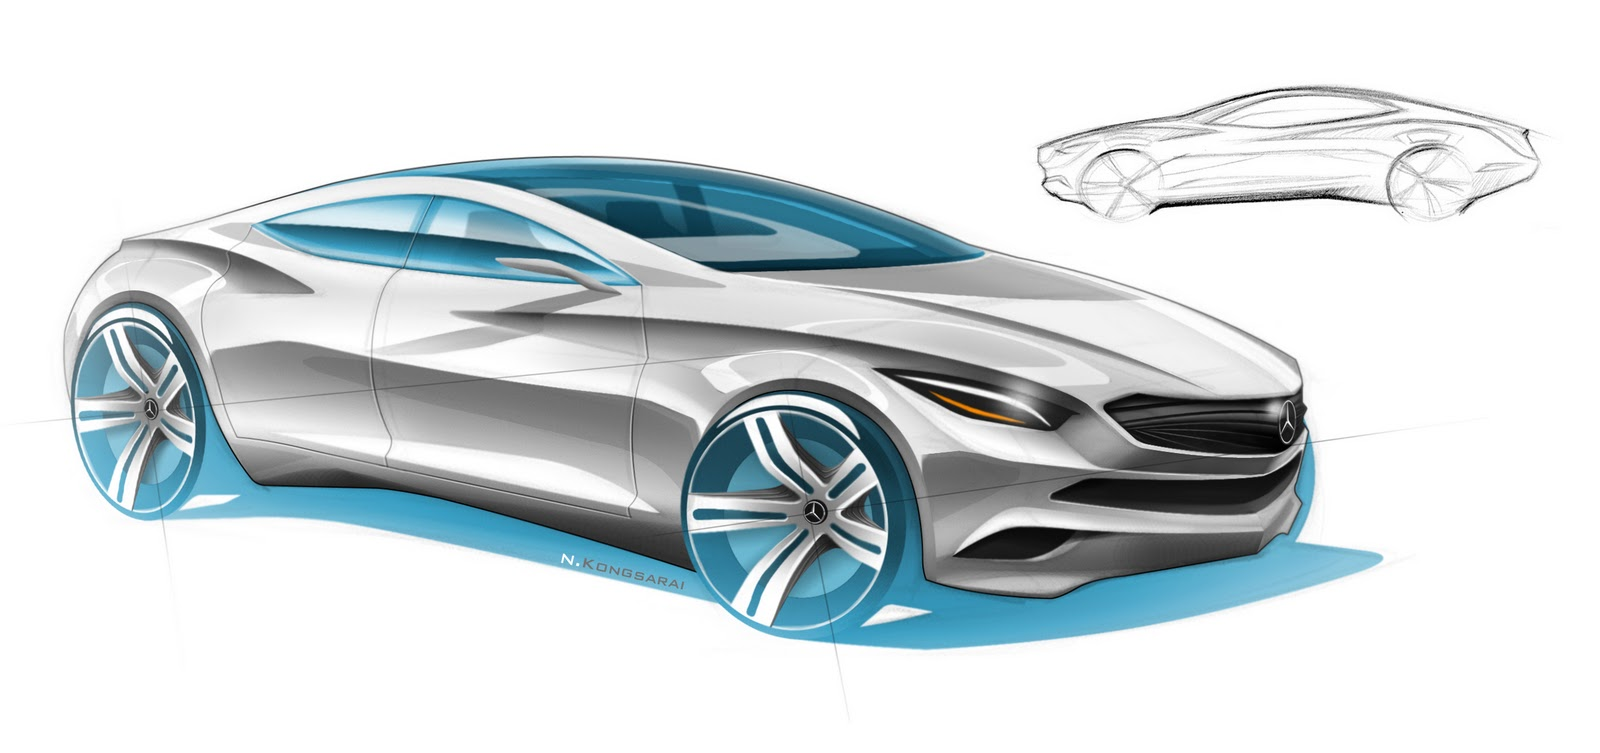 Mercedes benz biome concept car price best cars for Mercedes benz biome cost